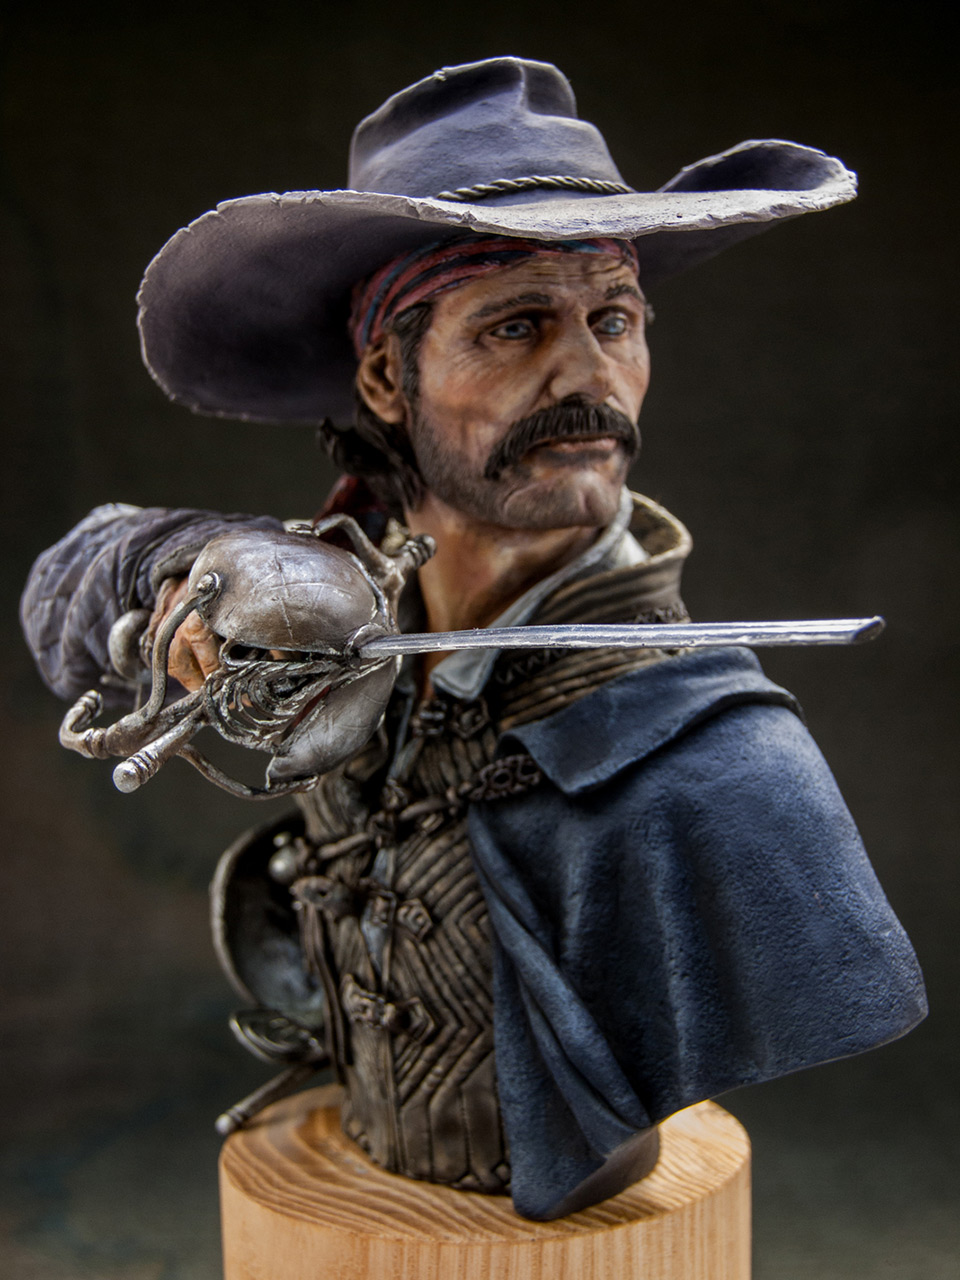 Figures: Diego Alatriste, photo #10